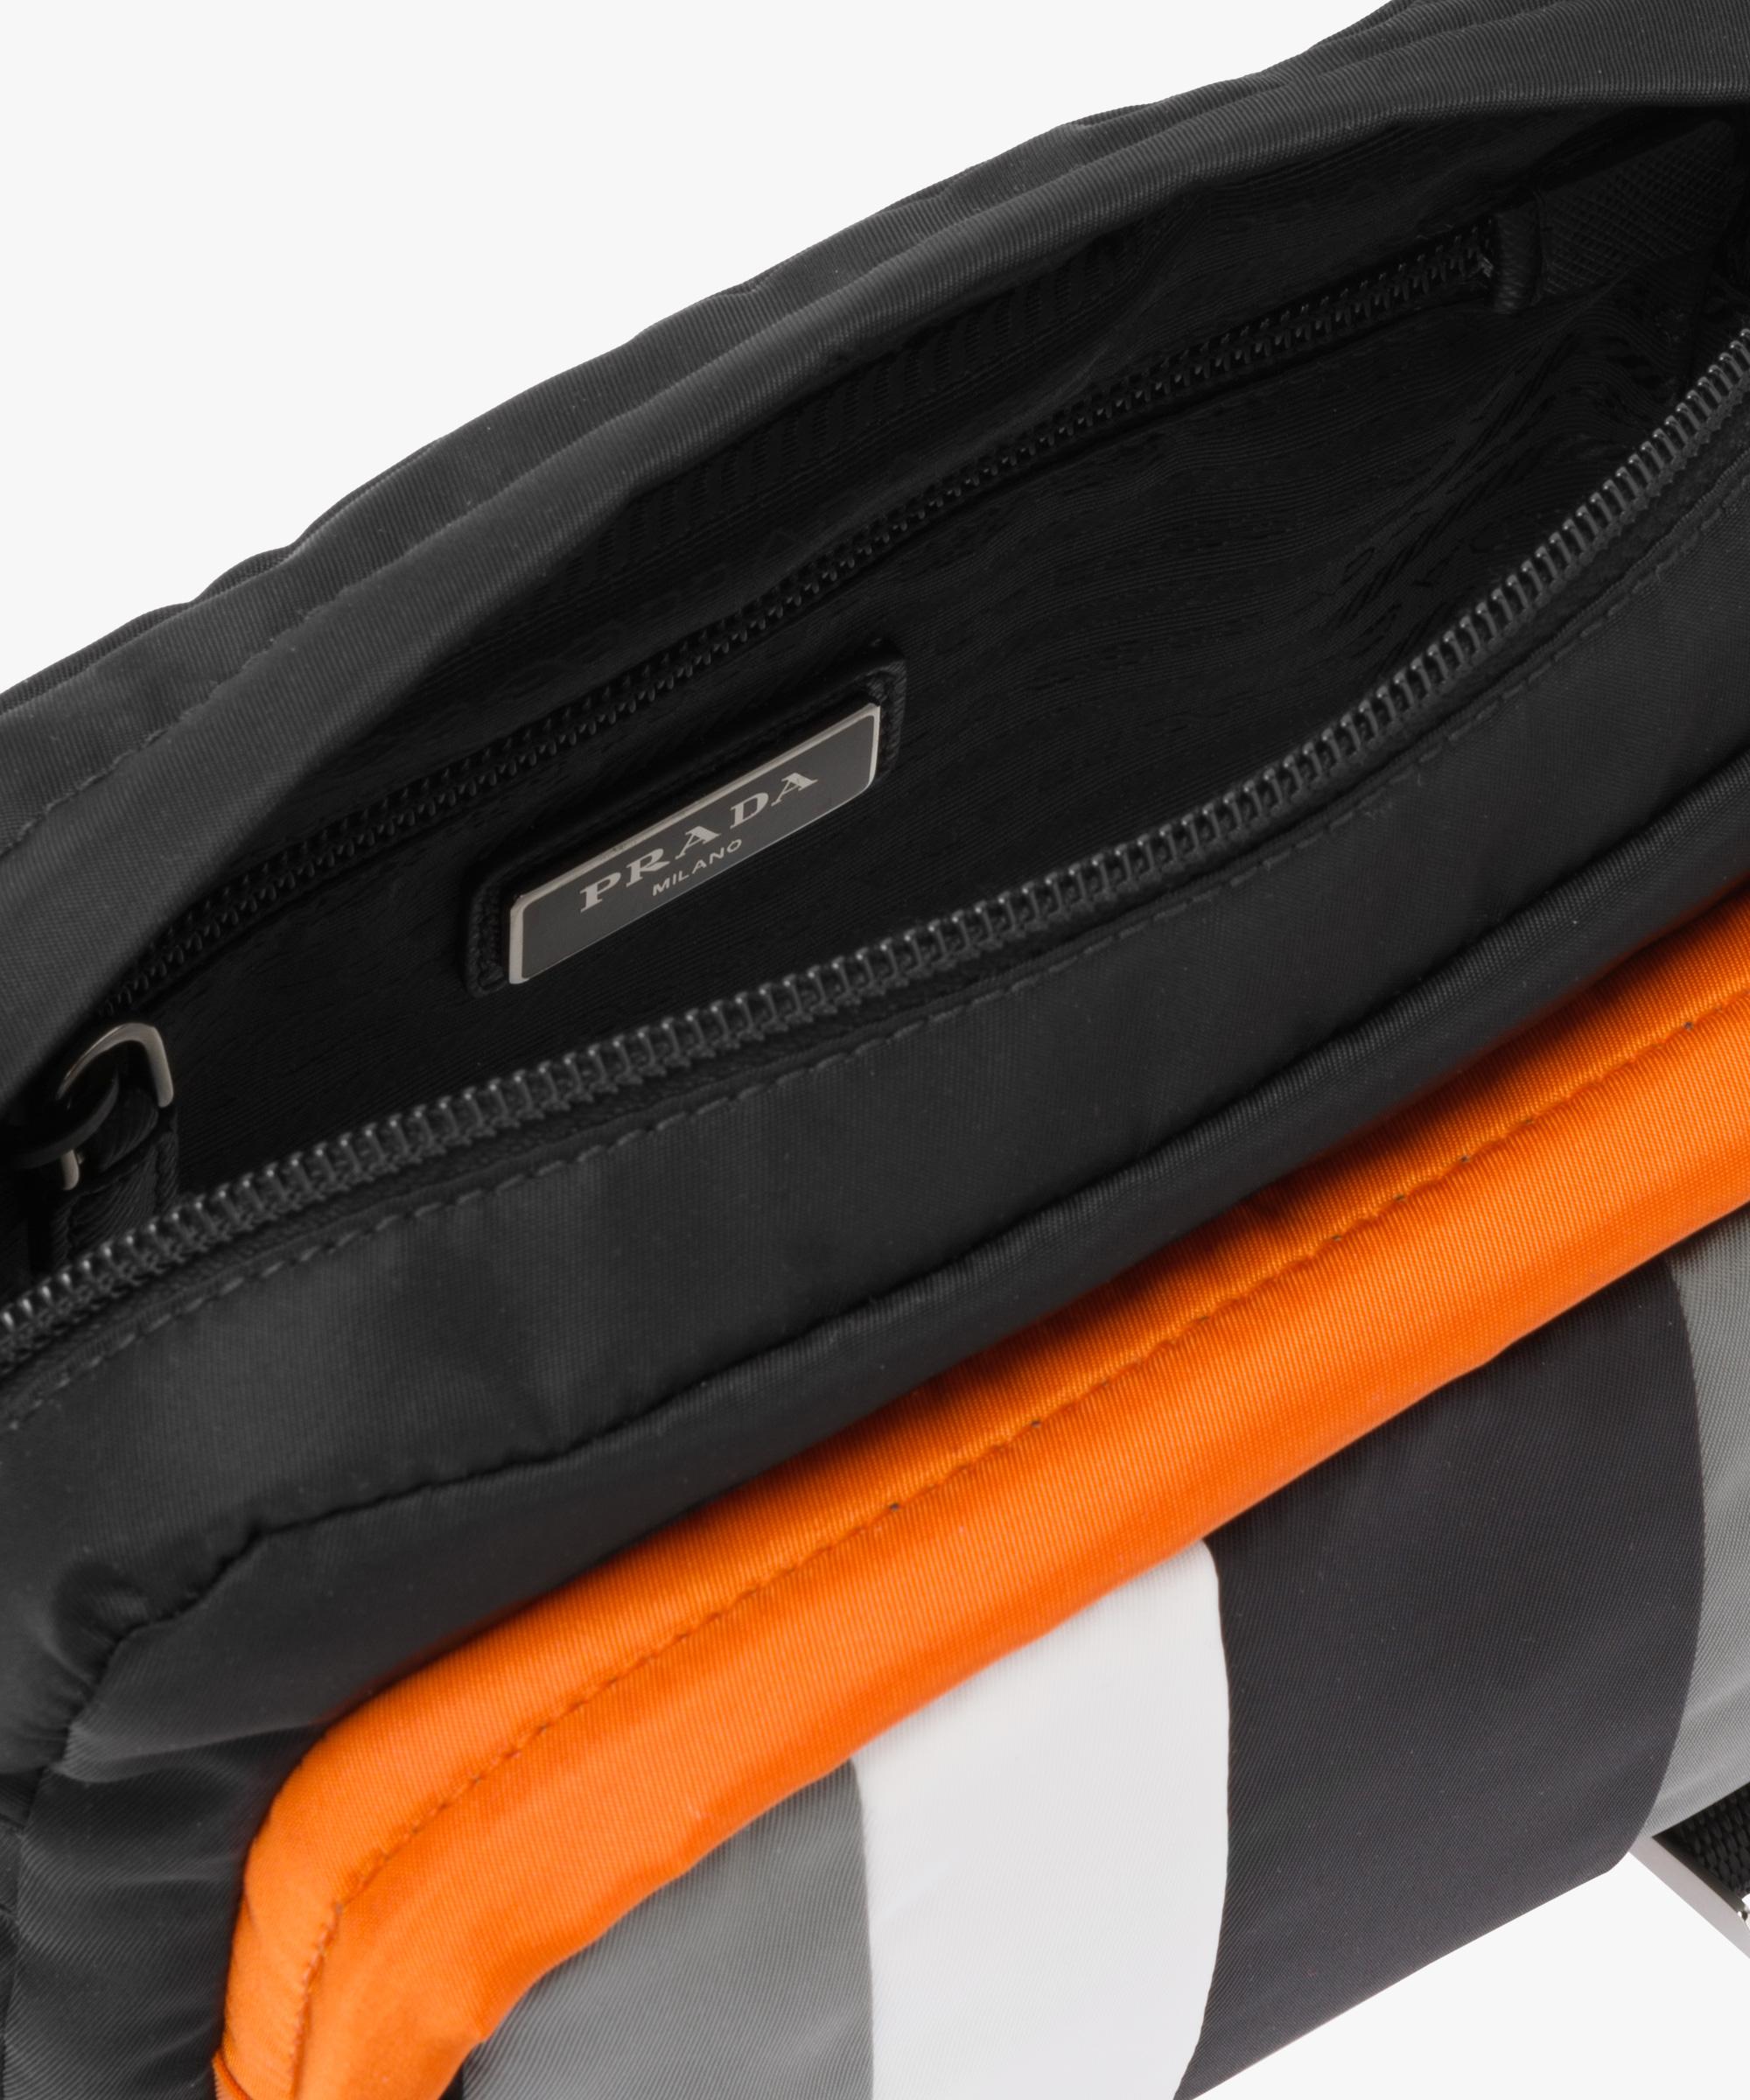 6fa7de10af7a Printed technical fabric bandoleer bag Prada BLACK SLATE GRAY ...